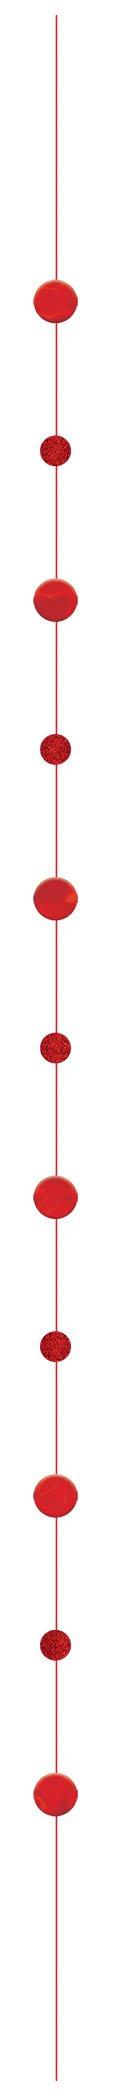 Balloon Fun Strings Red